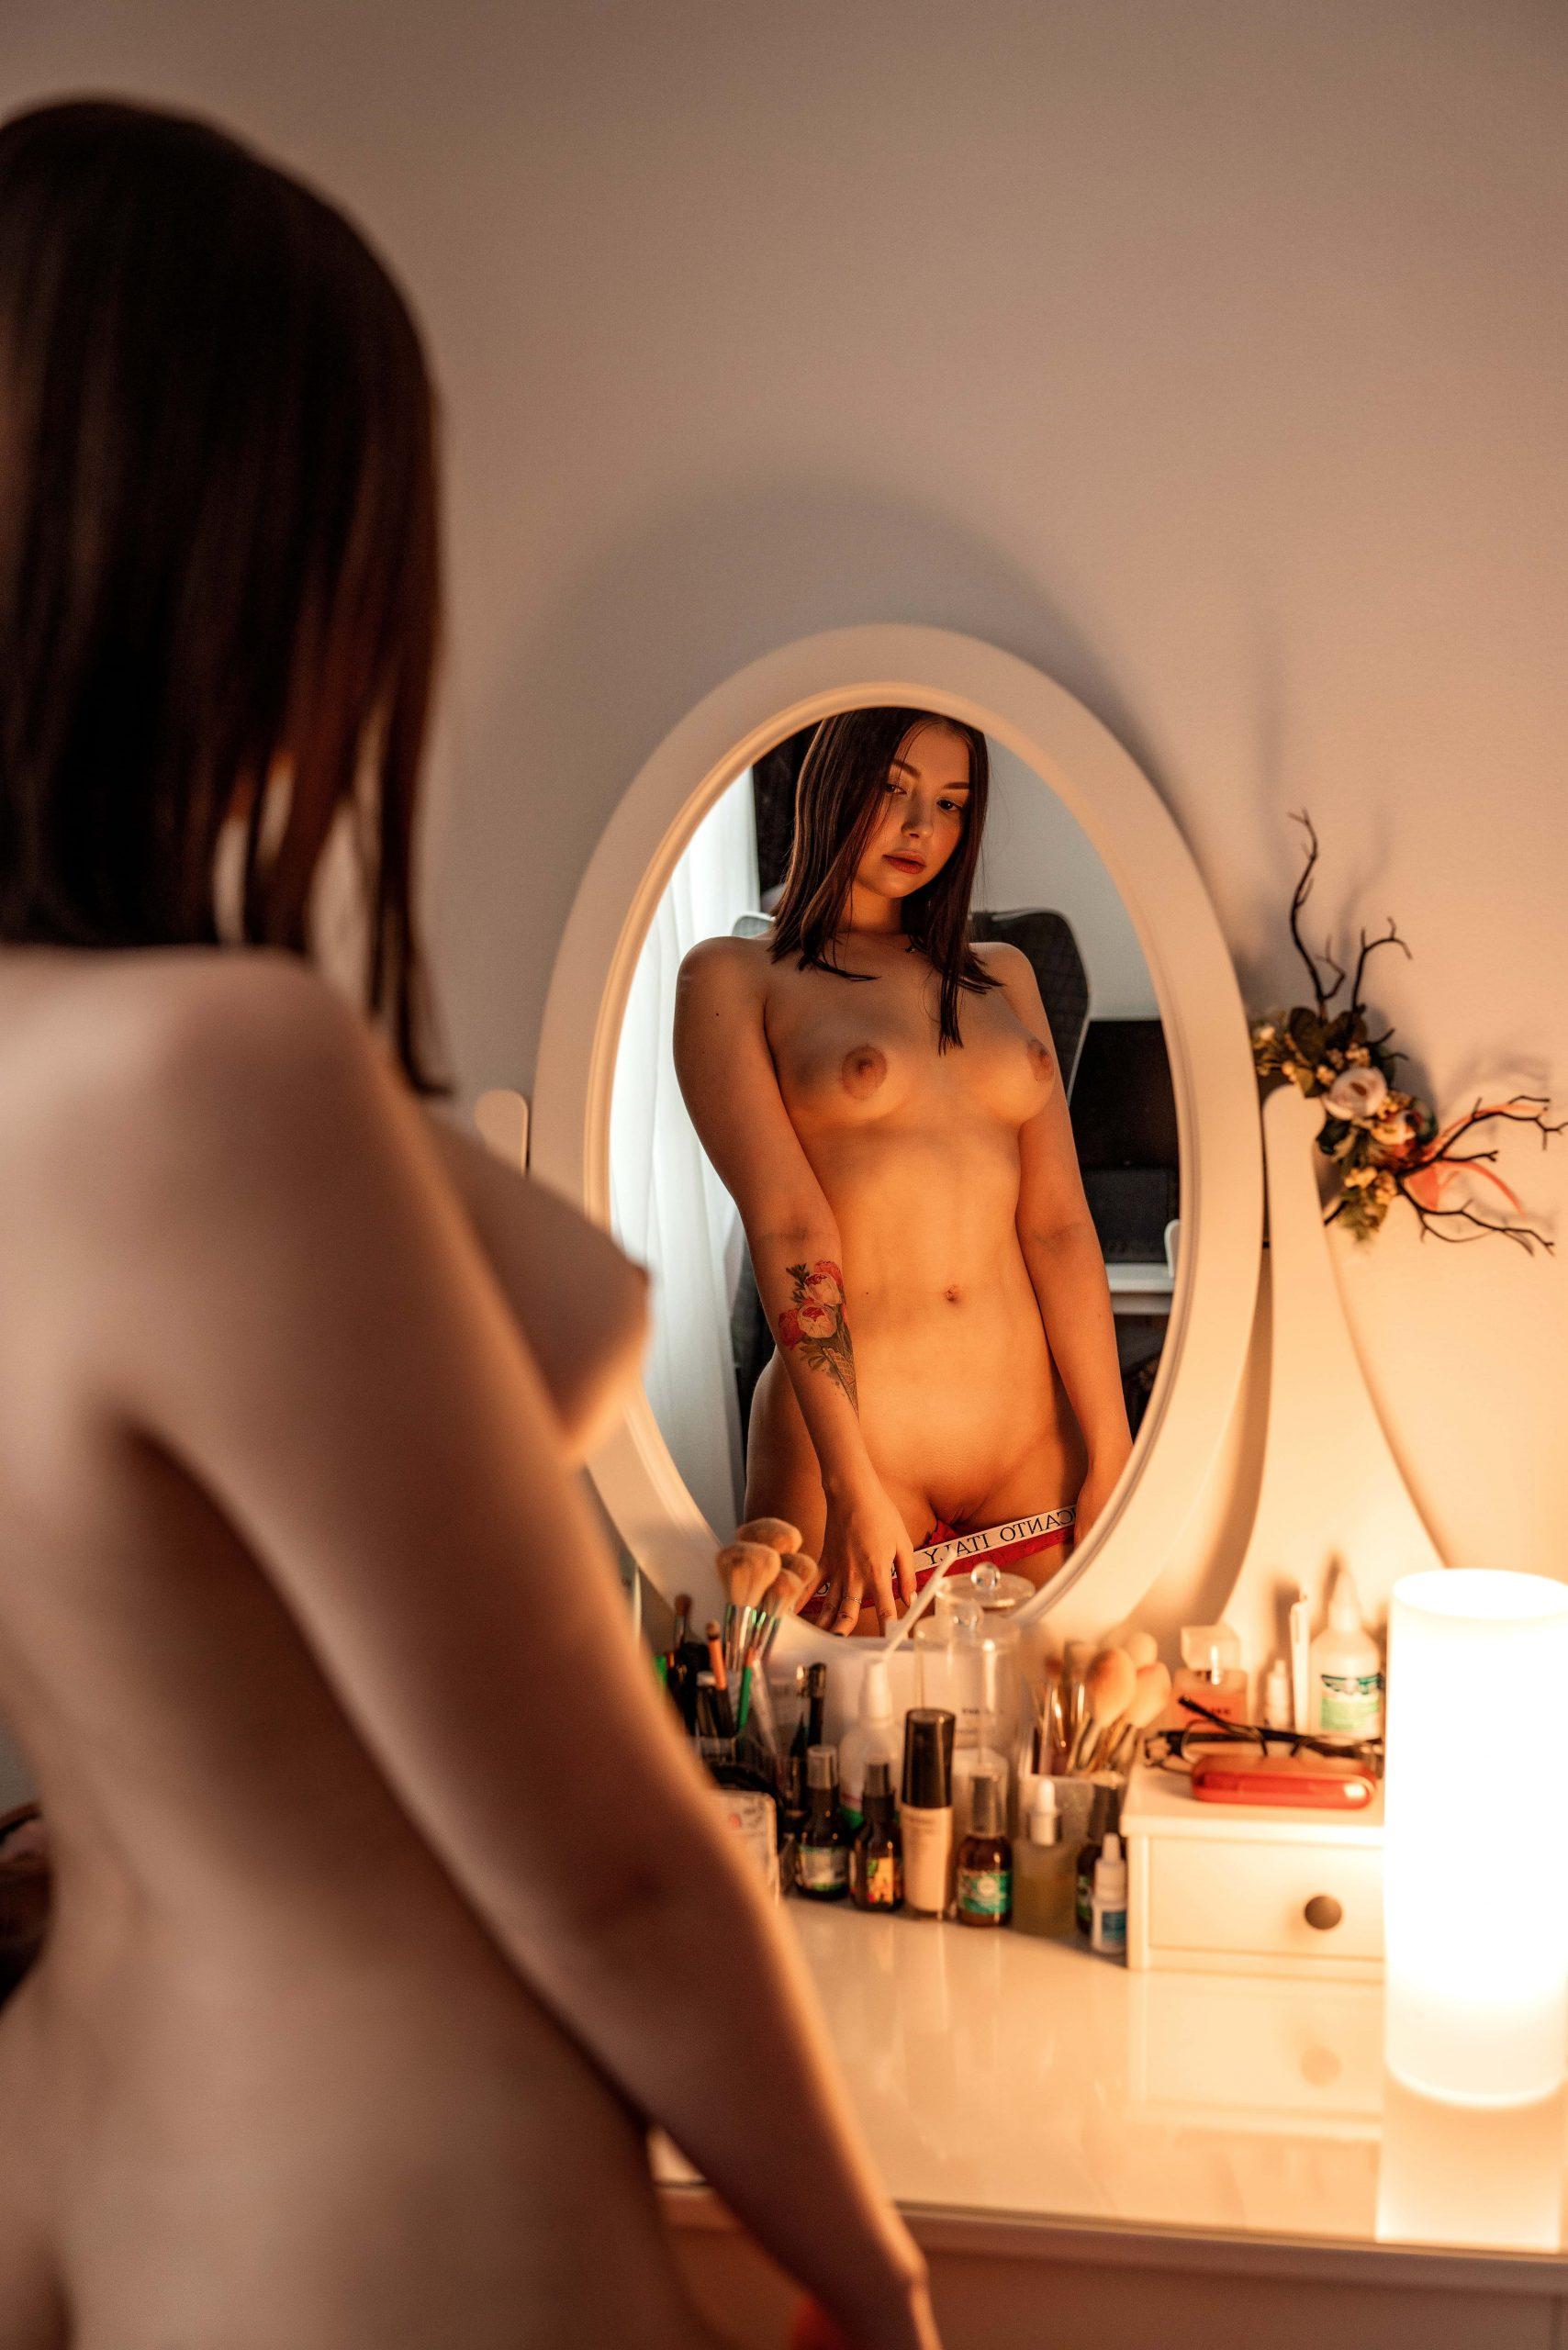 Taking Advantage Of My New Mirror